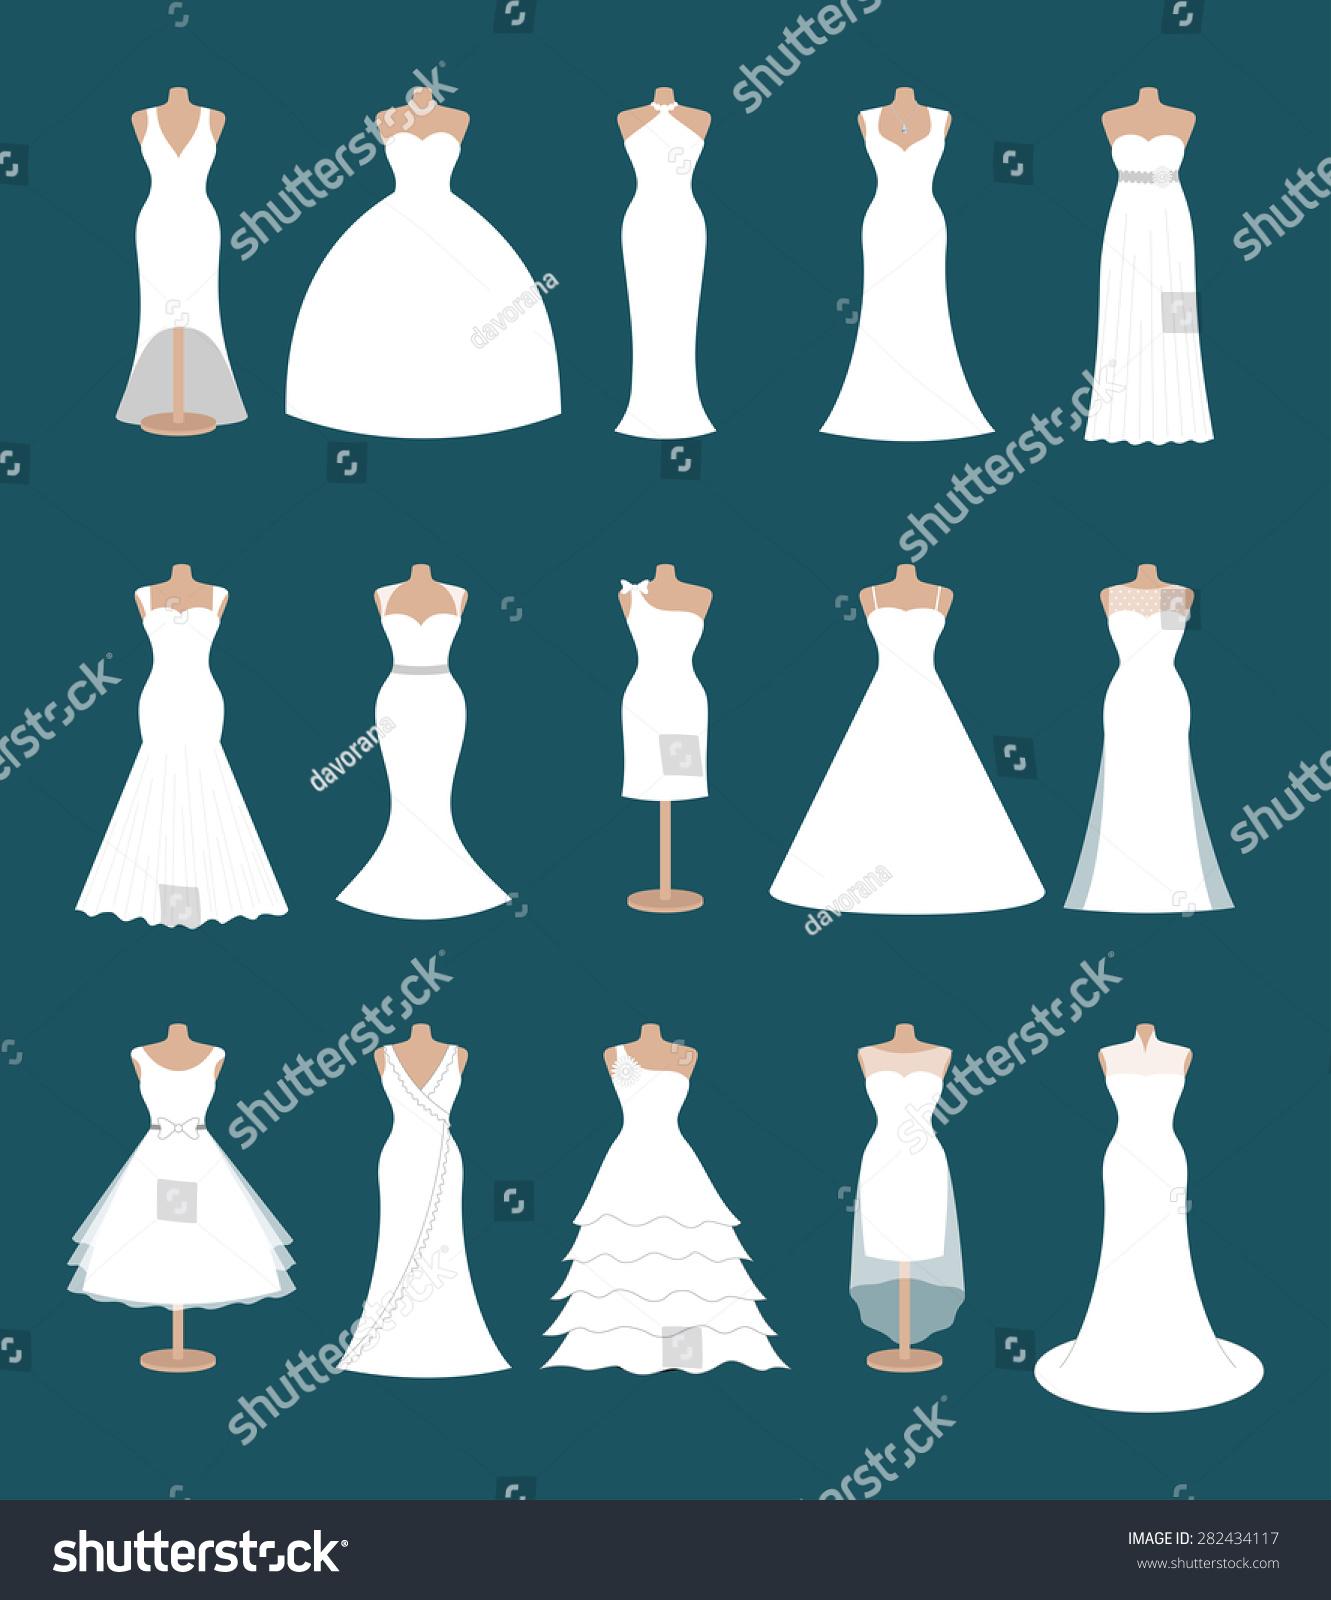 wedding dress silhouettes different wedding dresses Ballgown